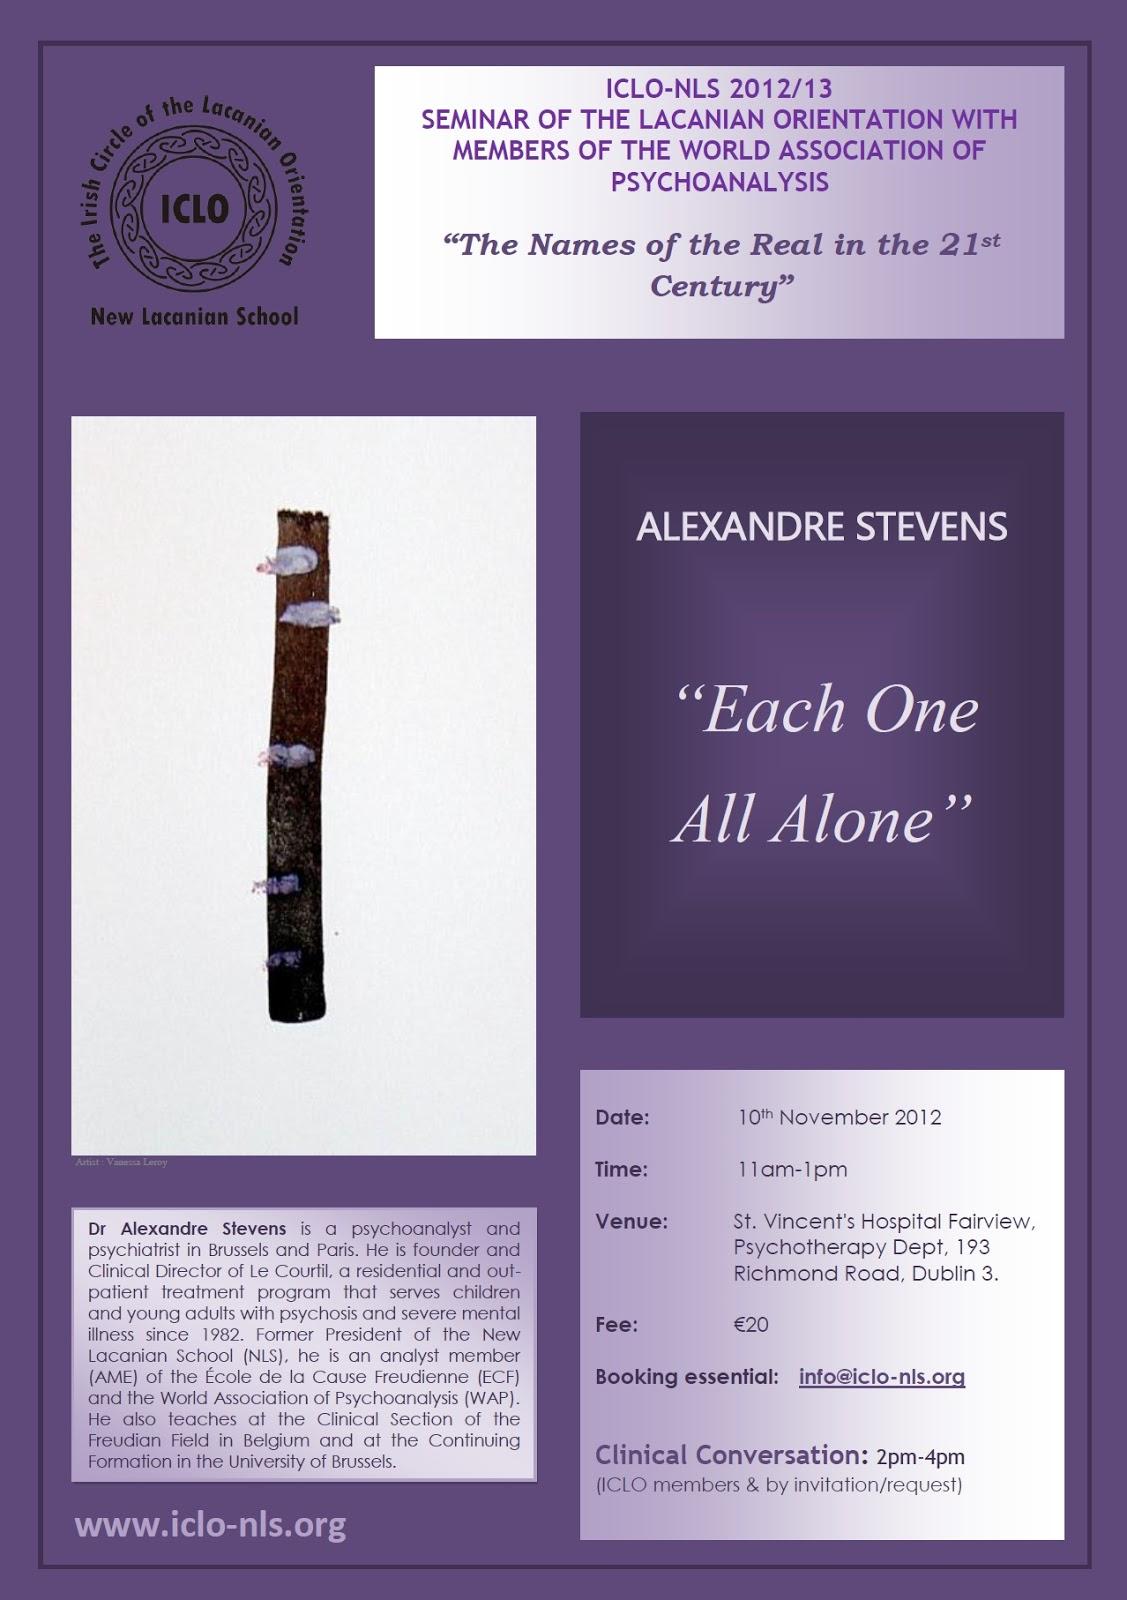 http://1.bp.blogspot.com/-Dg0W3gmqauA/UJhP6VcHDpI/AAAAAAAAAH8/MjqPhZ-Dc5I/s1600/ICLO+Seminar+AStevensNov2012.jpg